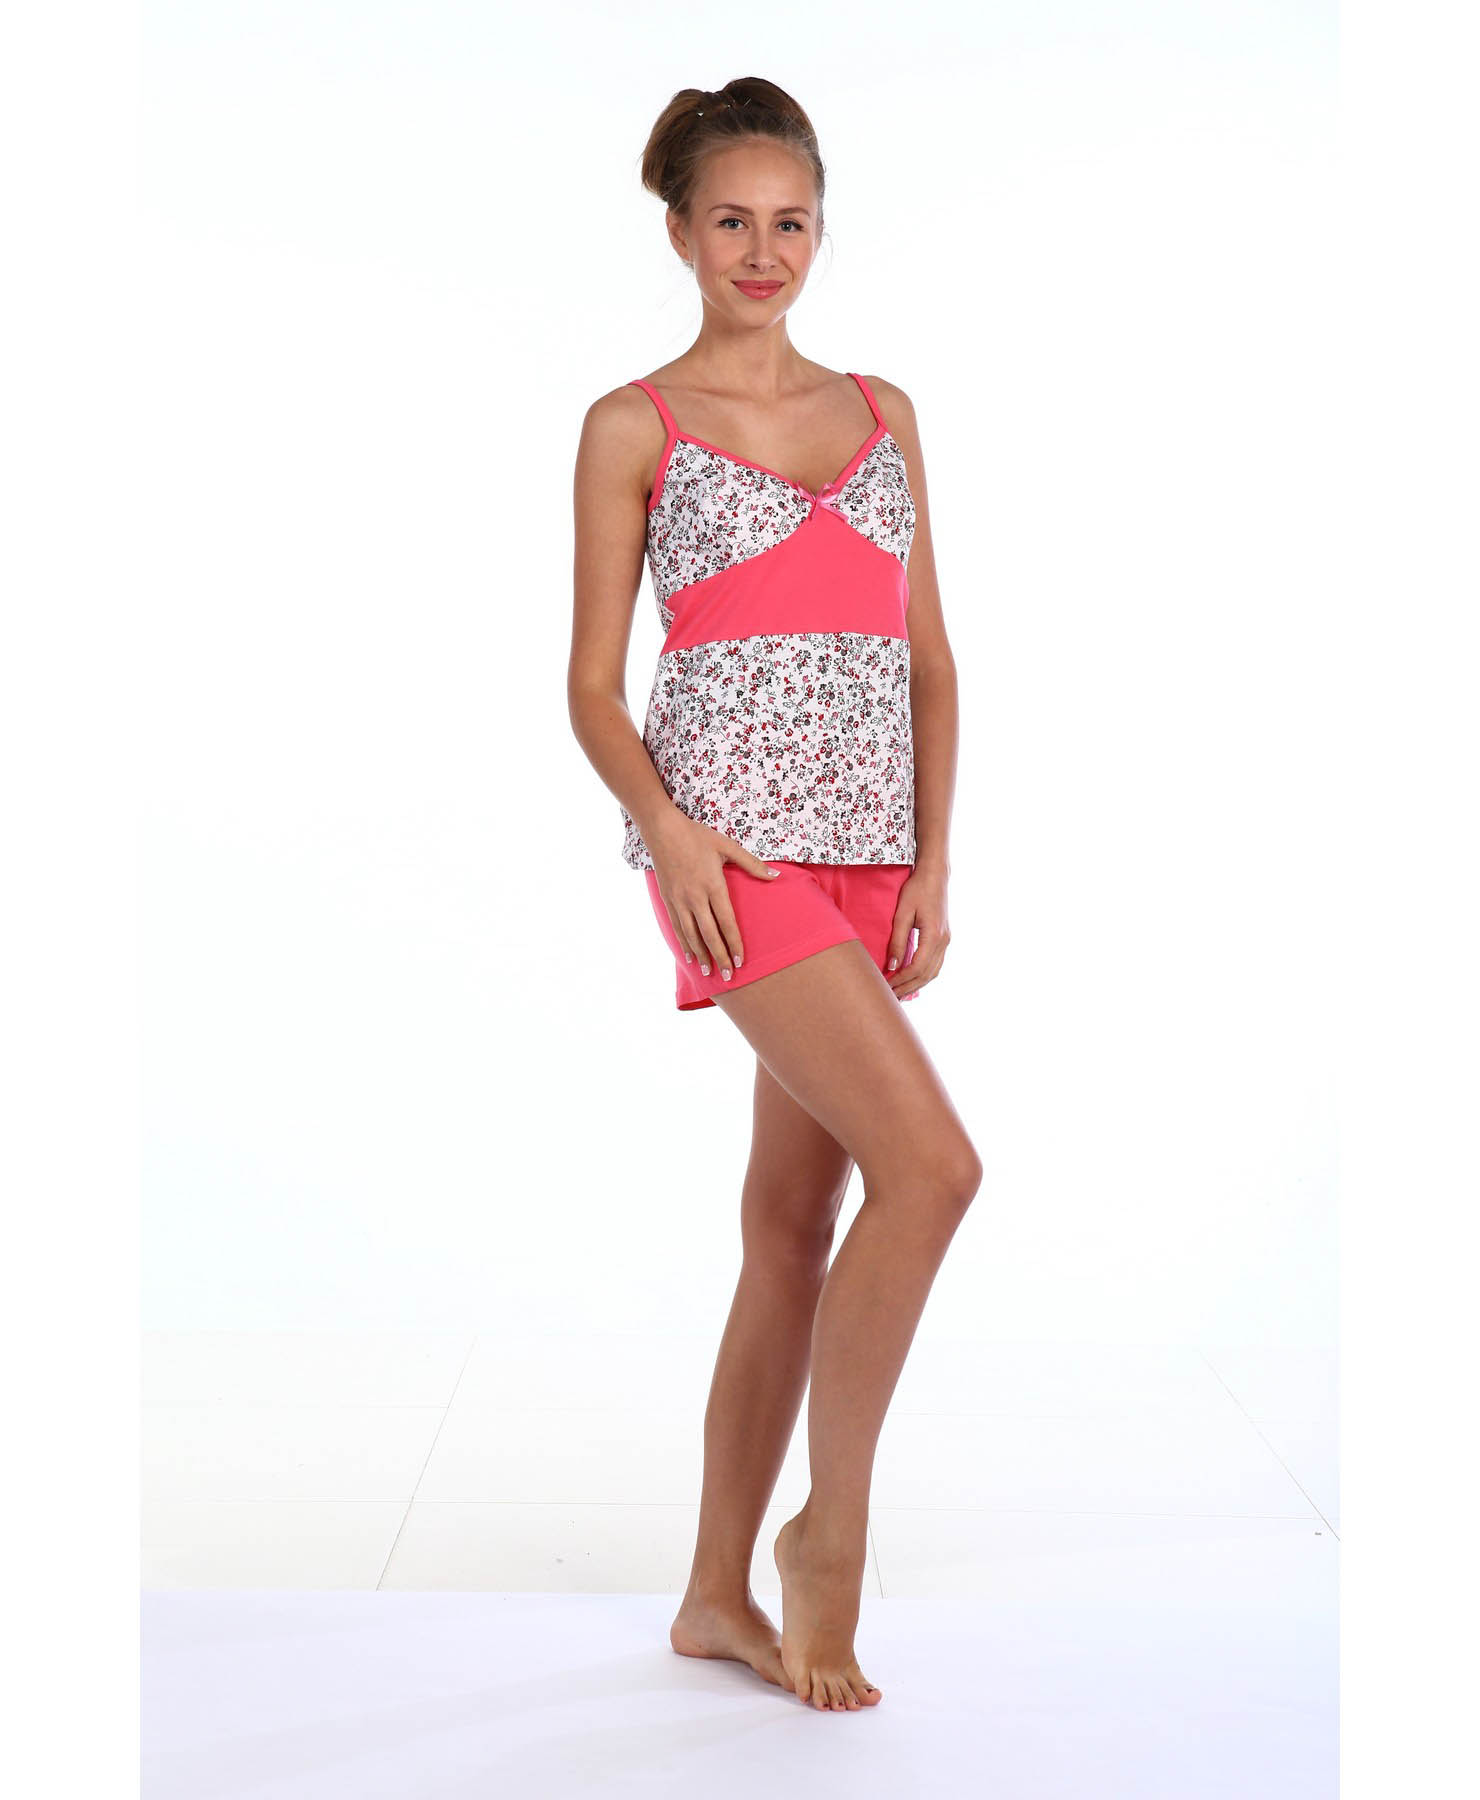 Пижамы Pastilla Пижама Палермо 1 Цвет: Розовый (xL) пижама жен mia cara майка шорты botanical aw15 ubl lst 264 р 42 44 1119503